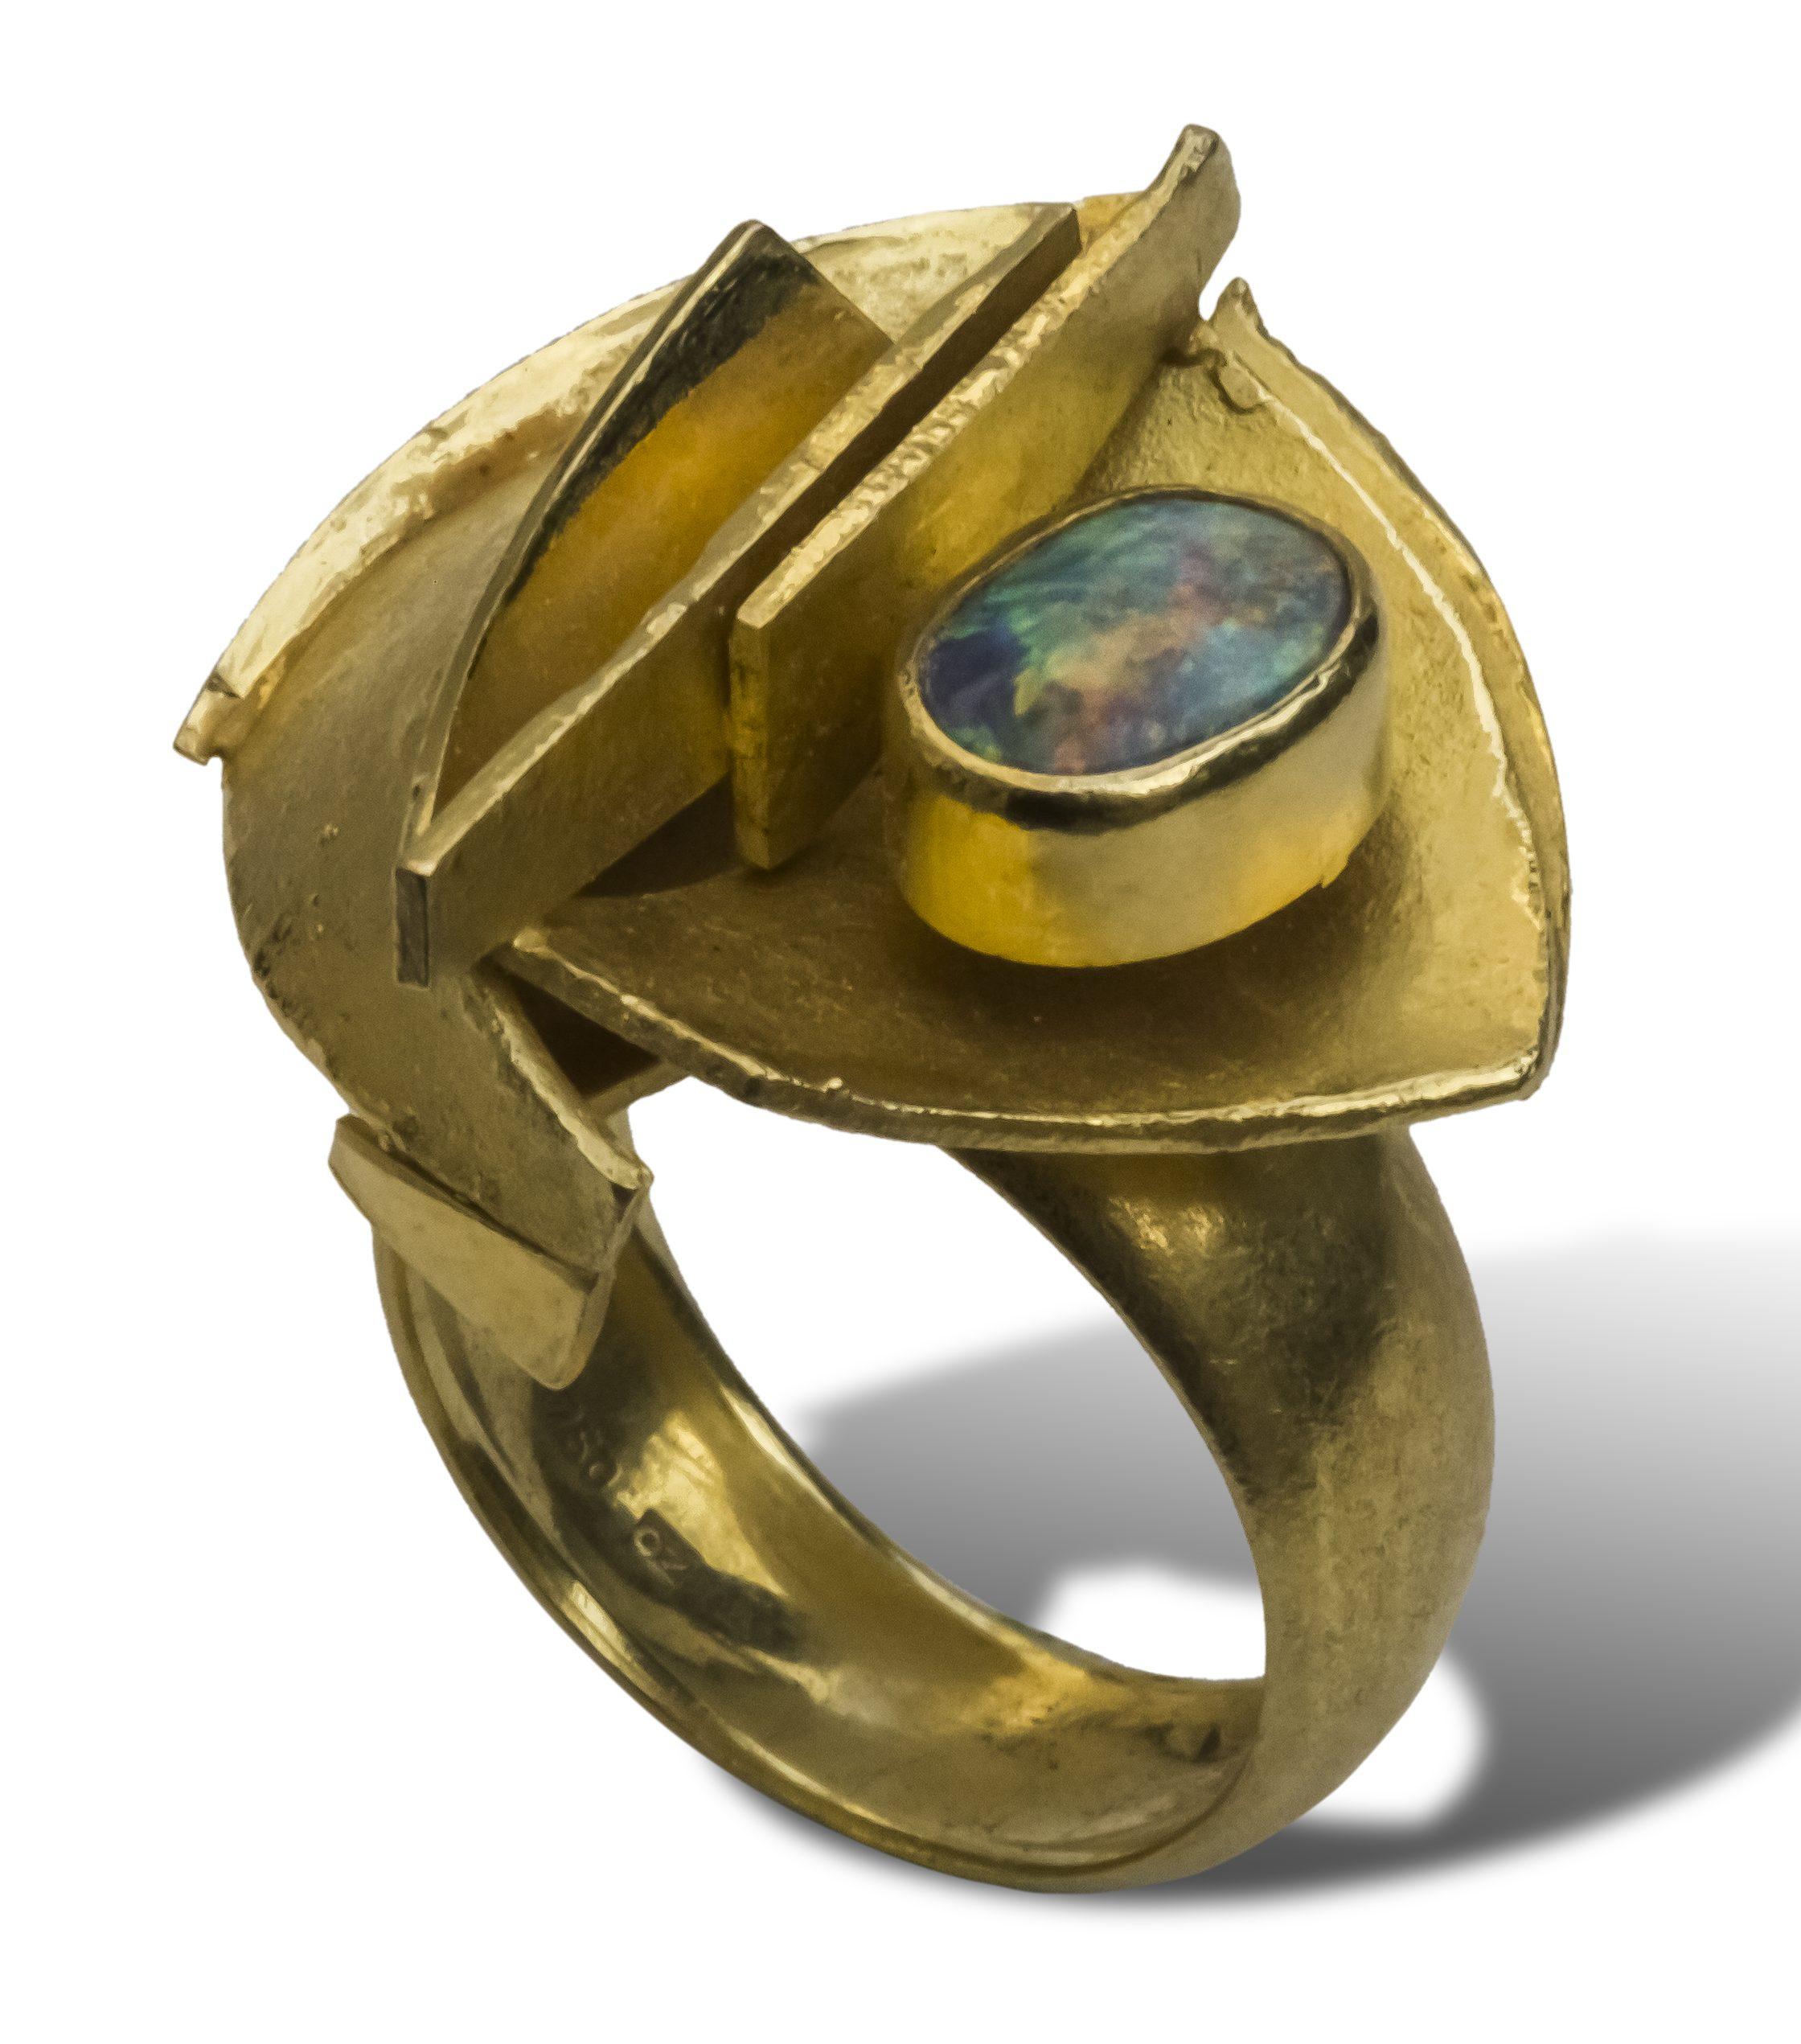 Othmar Zschaler, ring, 1968. Collectie Ida Boelen-van Gelder. Fotografie Aldo Smit©